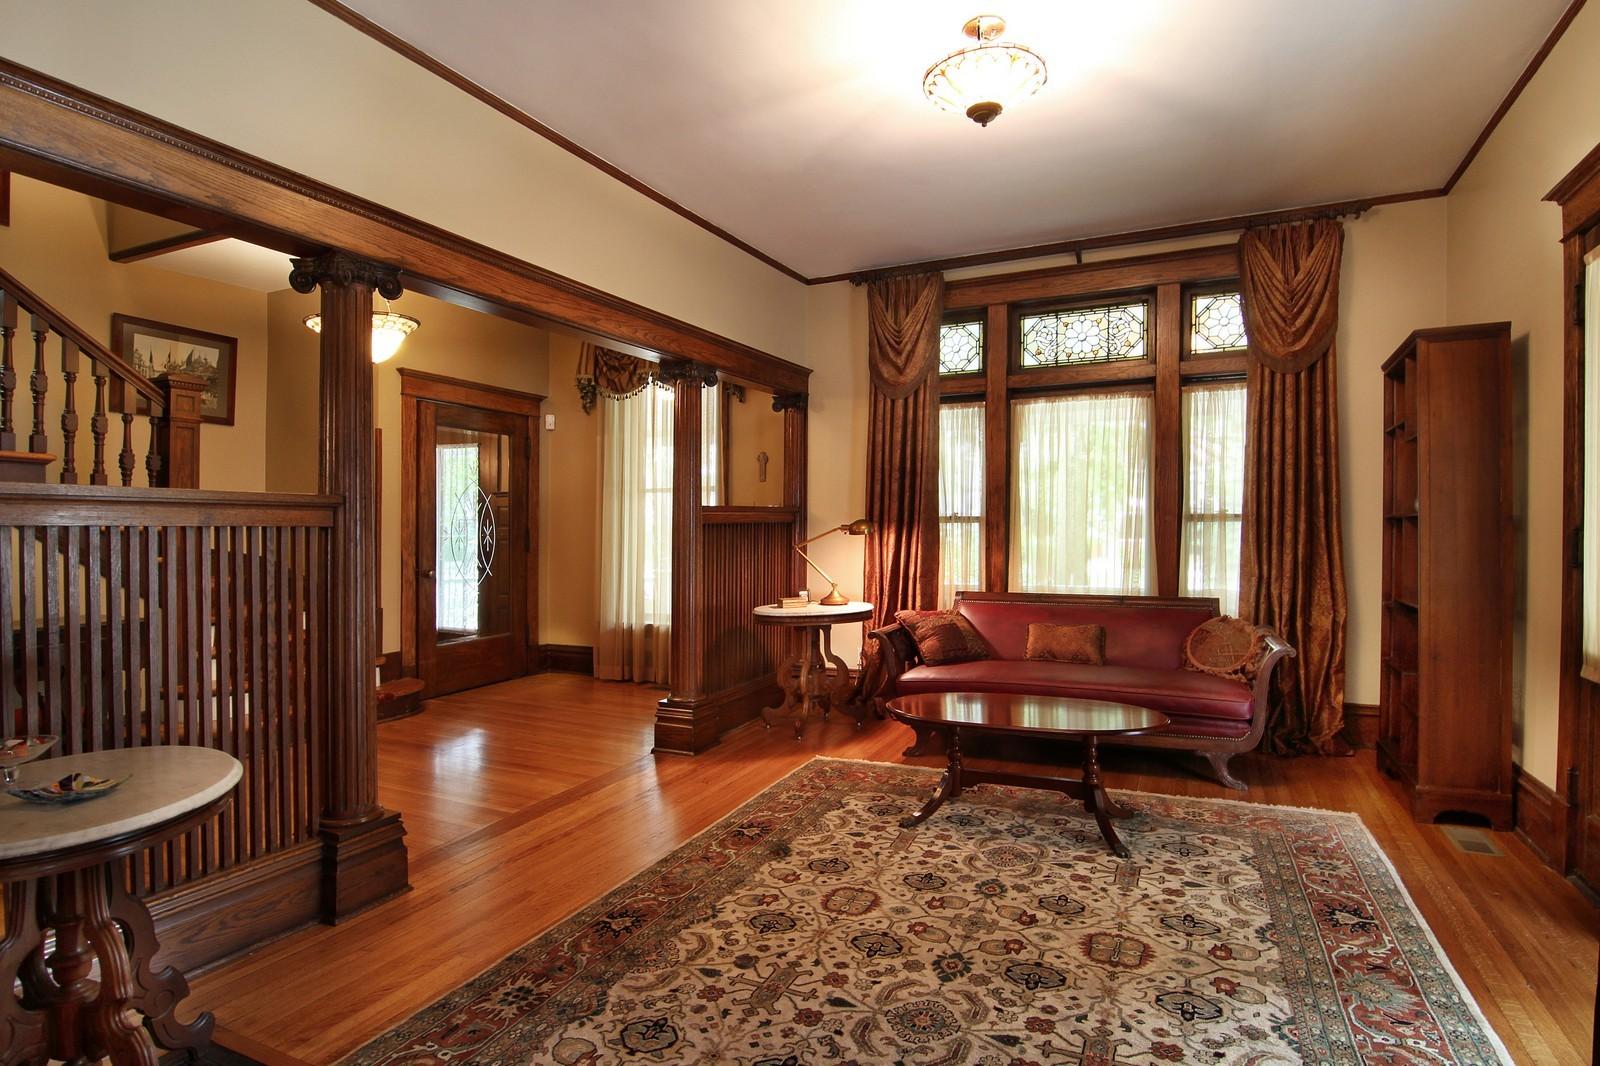 Real Estate Photography - 228 LaGrange Rd, La Grange, IL, 60525 - Living Room